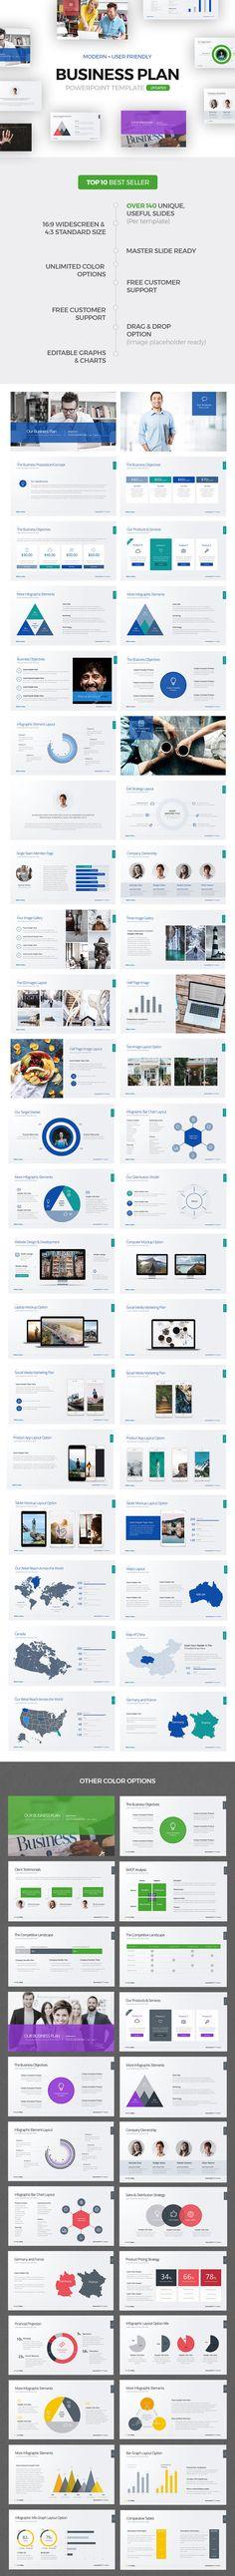 portfolio ppt template free - Ataum berglauf-verband com